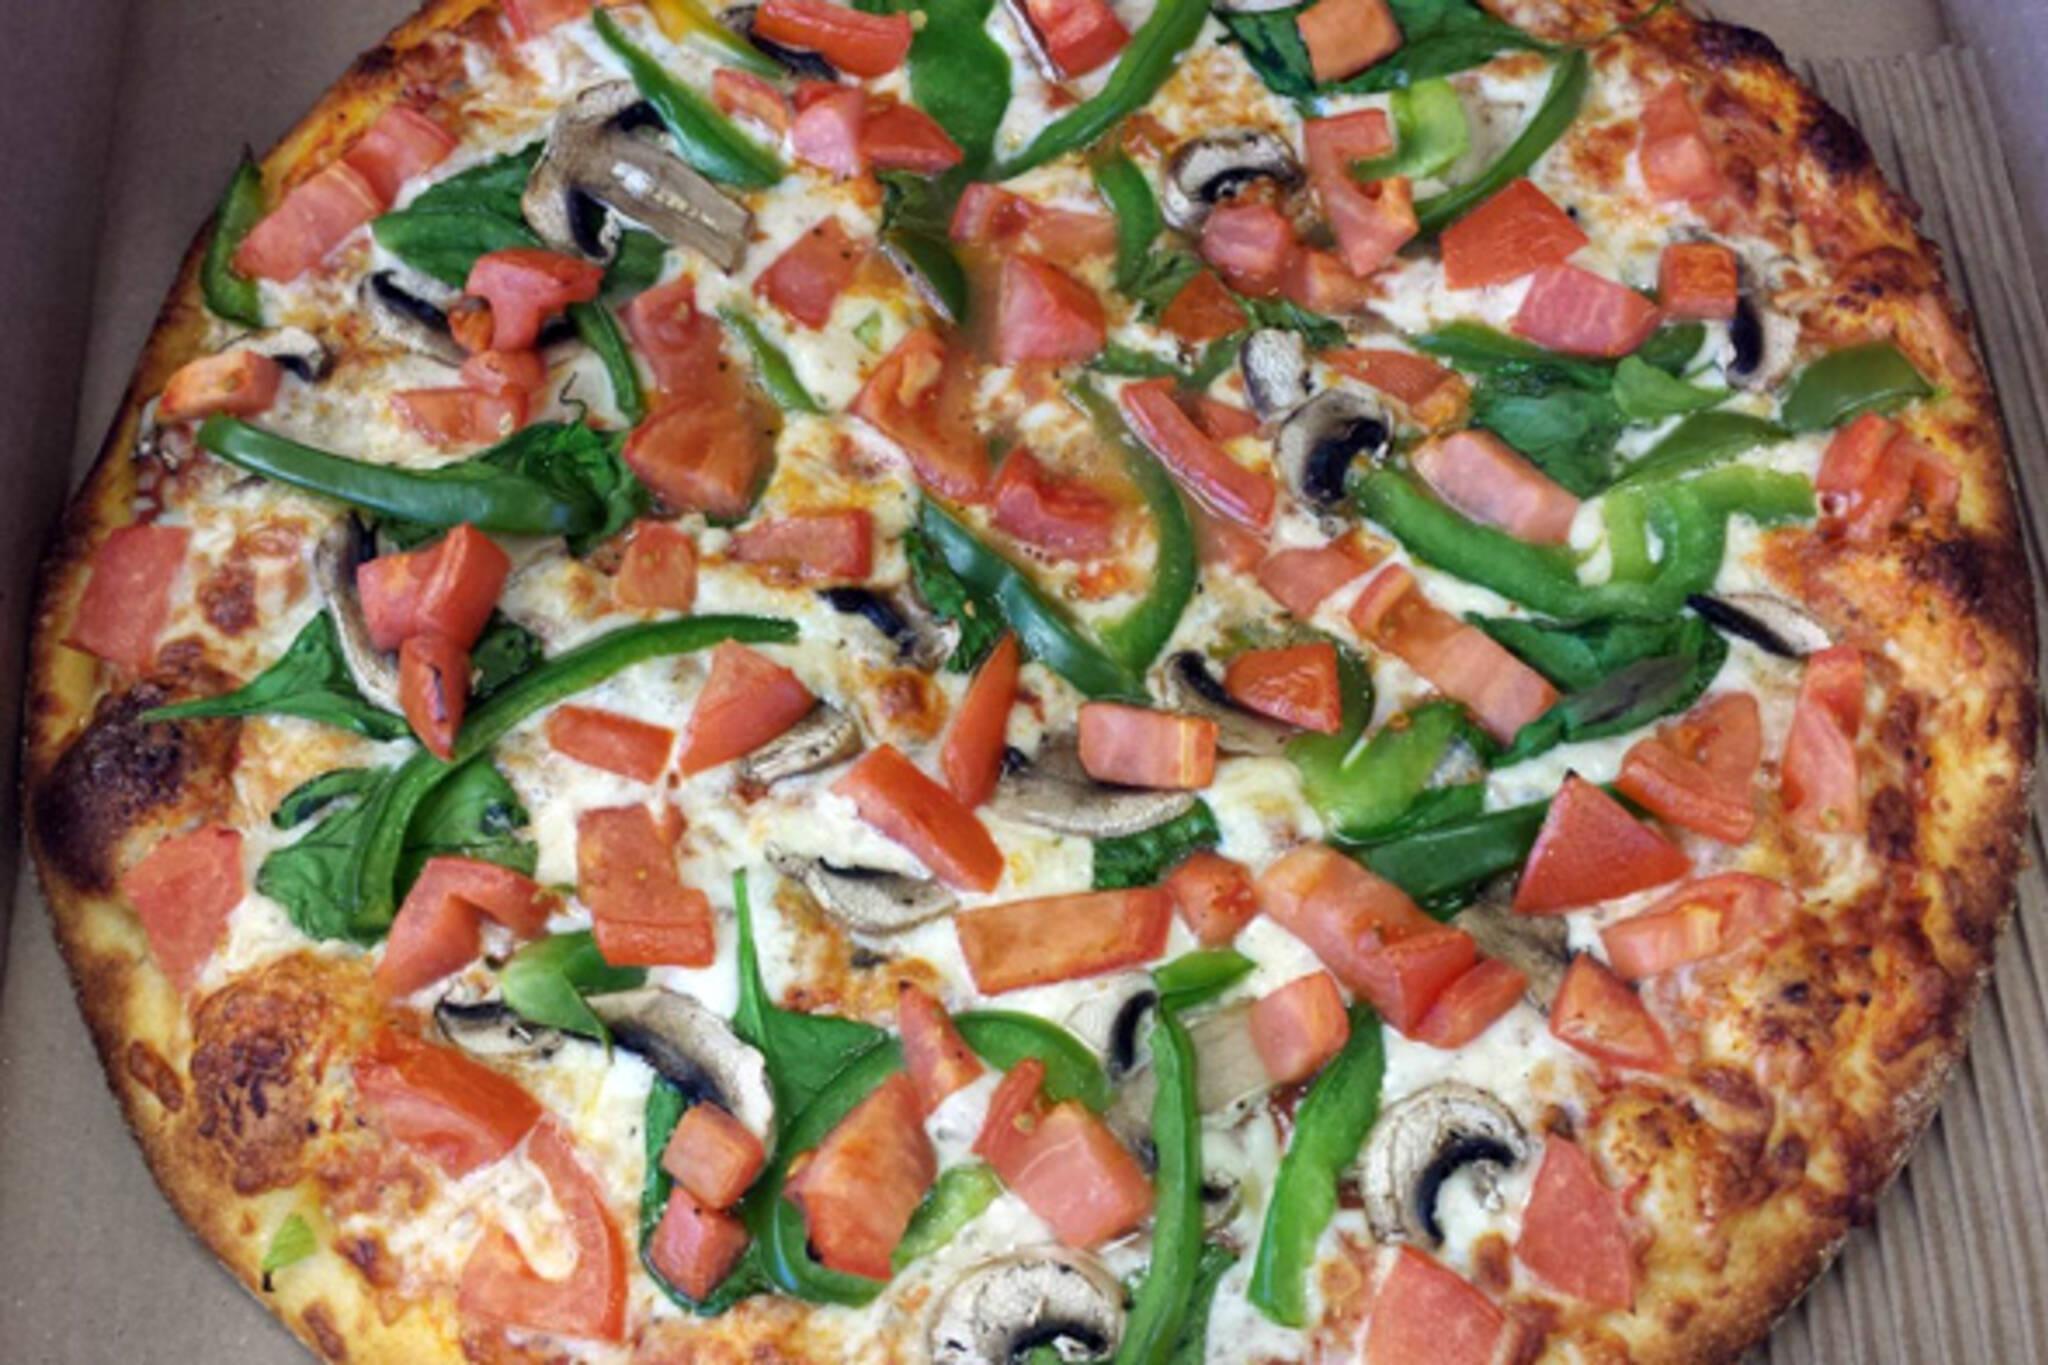 halal pizza toronto